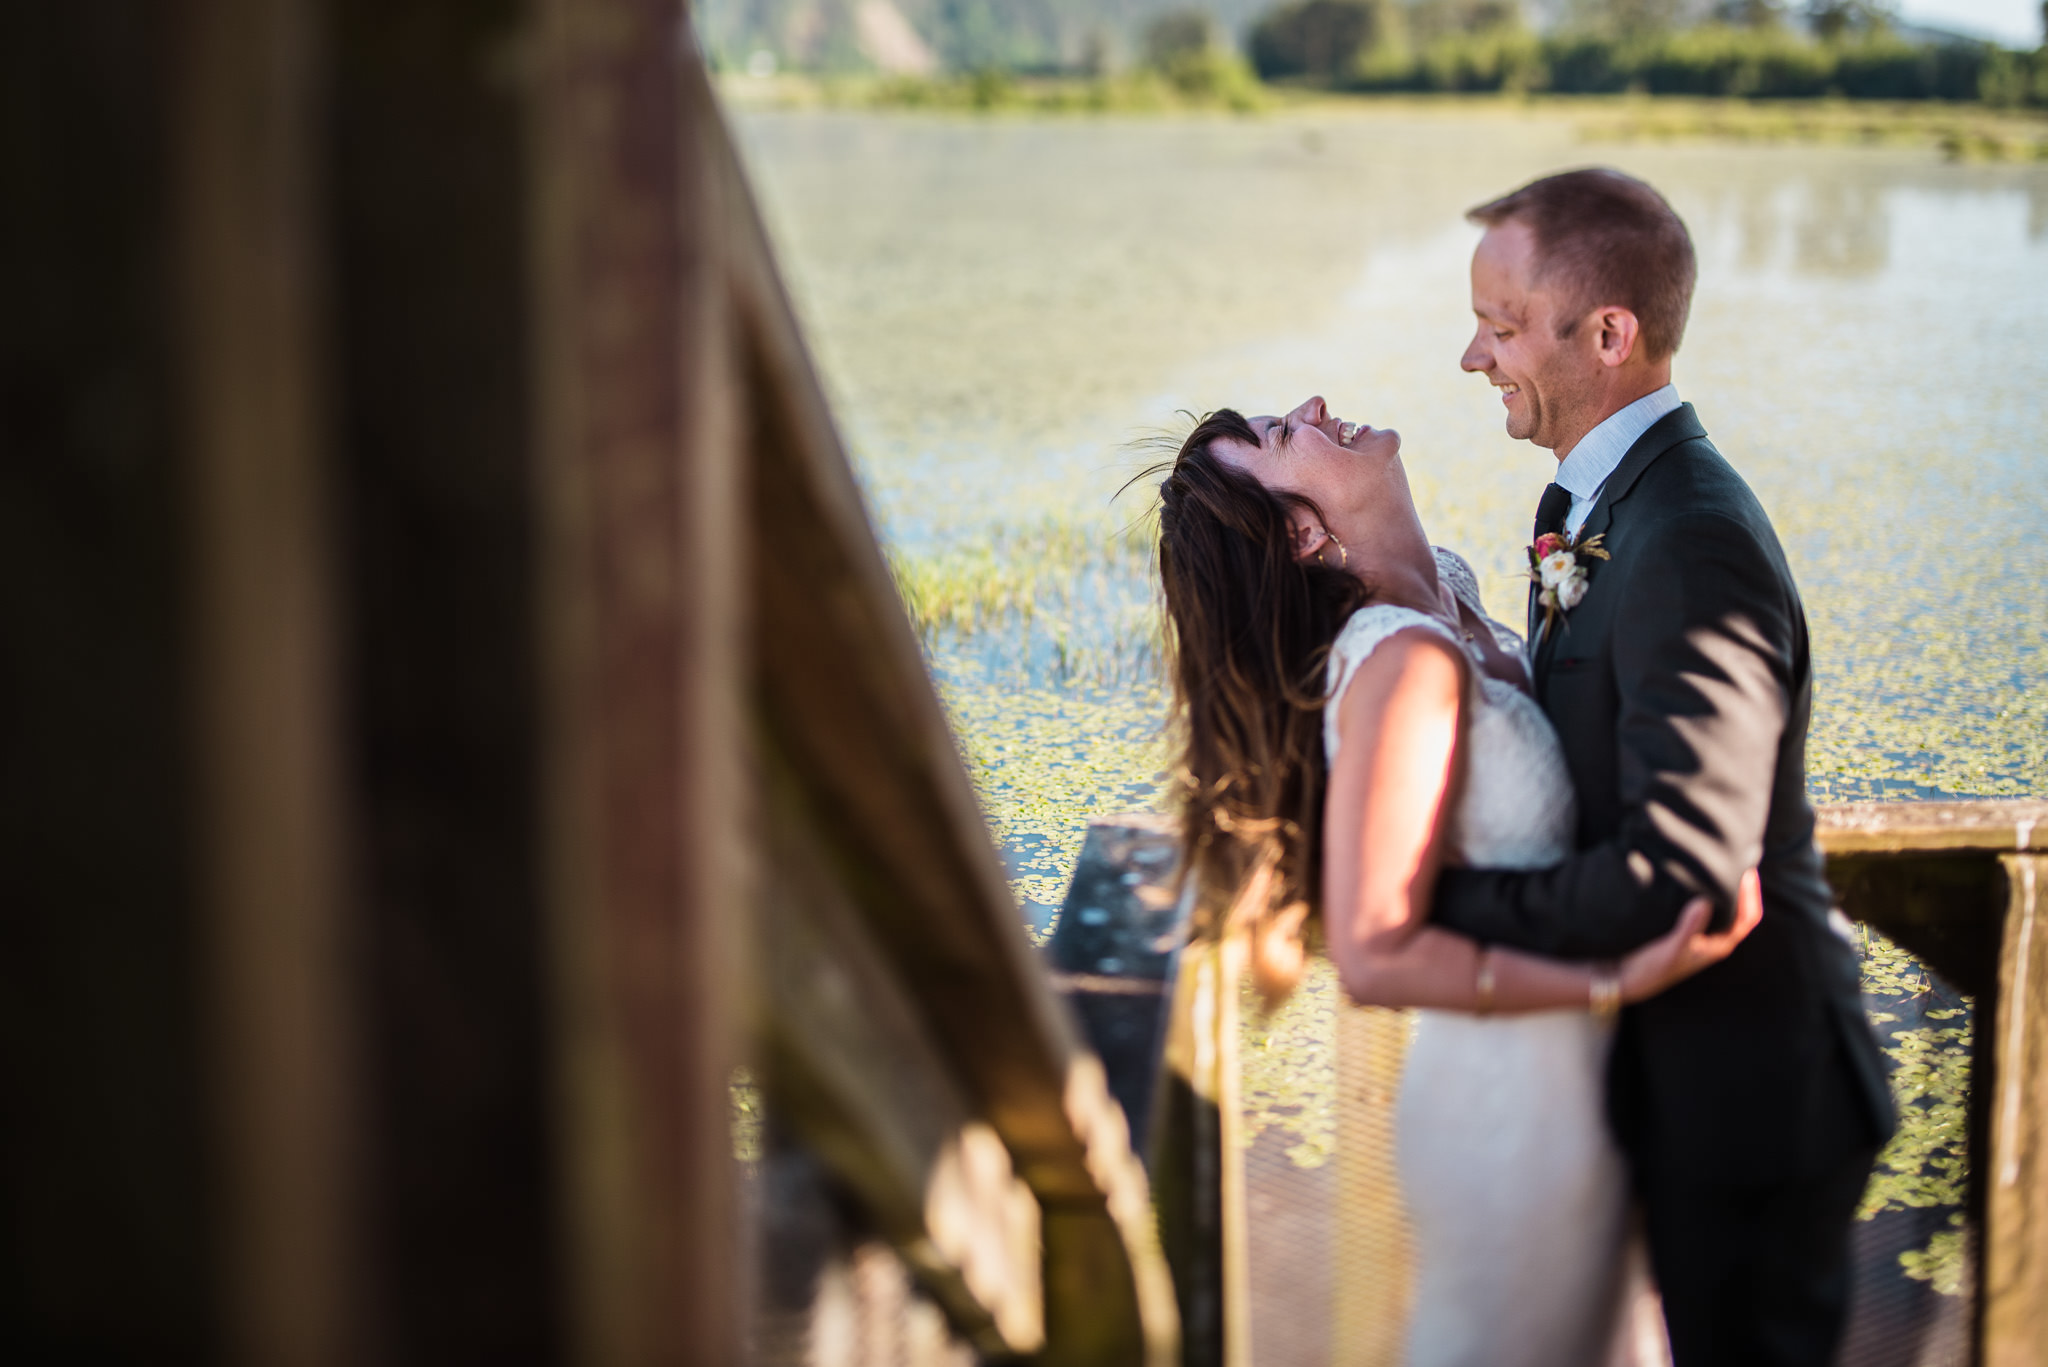 Melanie-Matt-Pitt-Lake-Post-Wedding-Shoot-Victoria-Wedding-Photographers-9.jpg